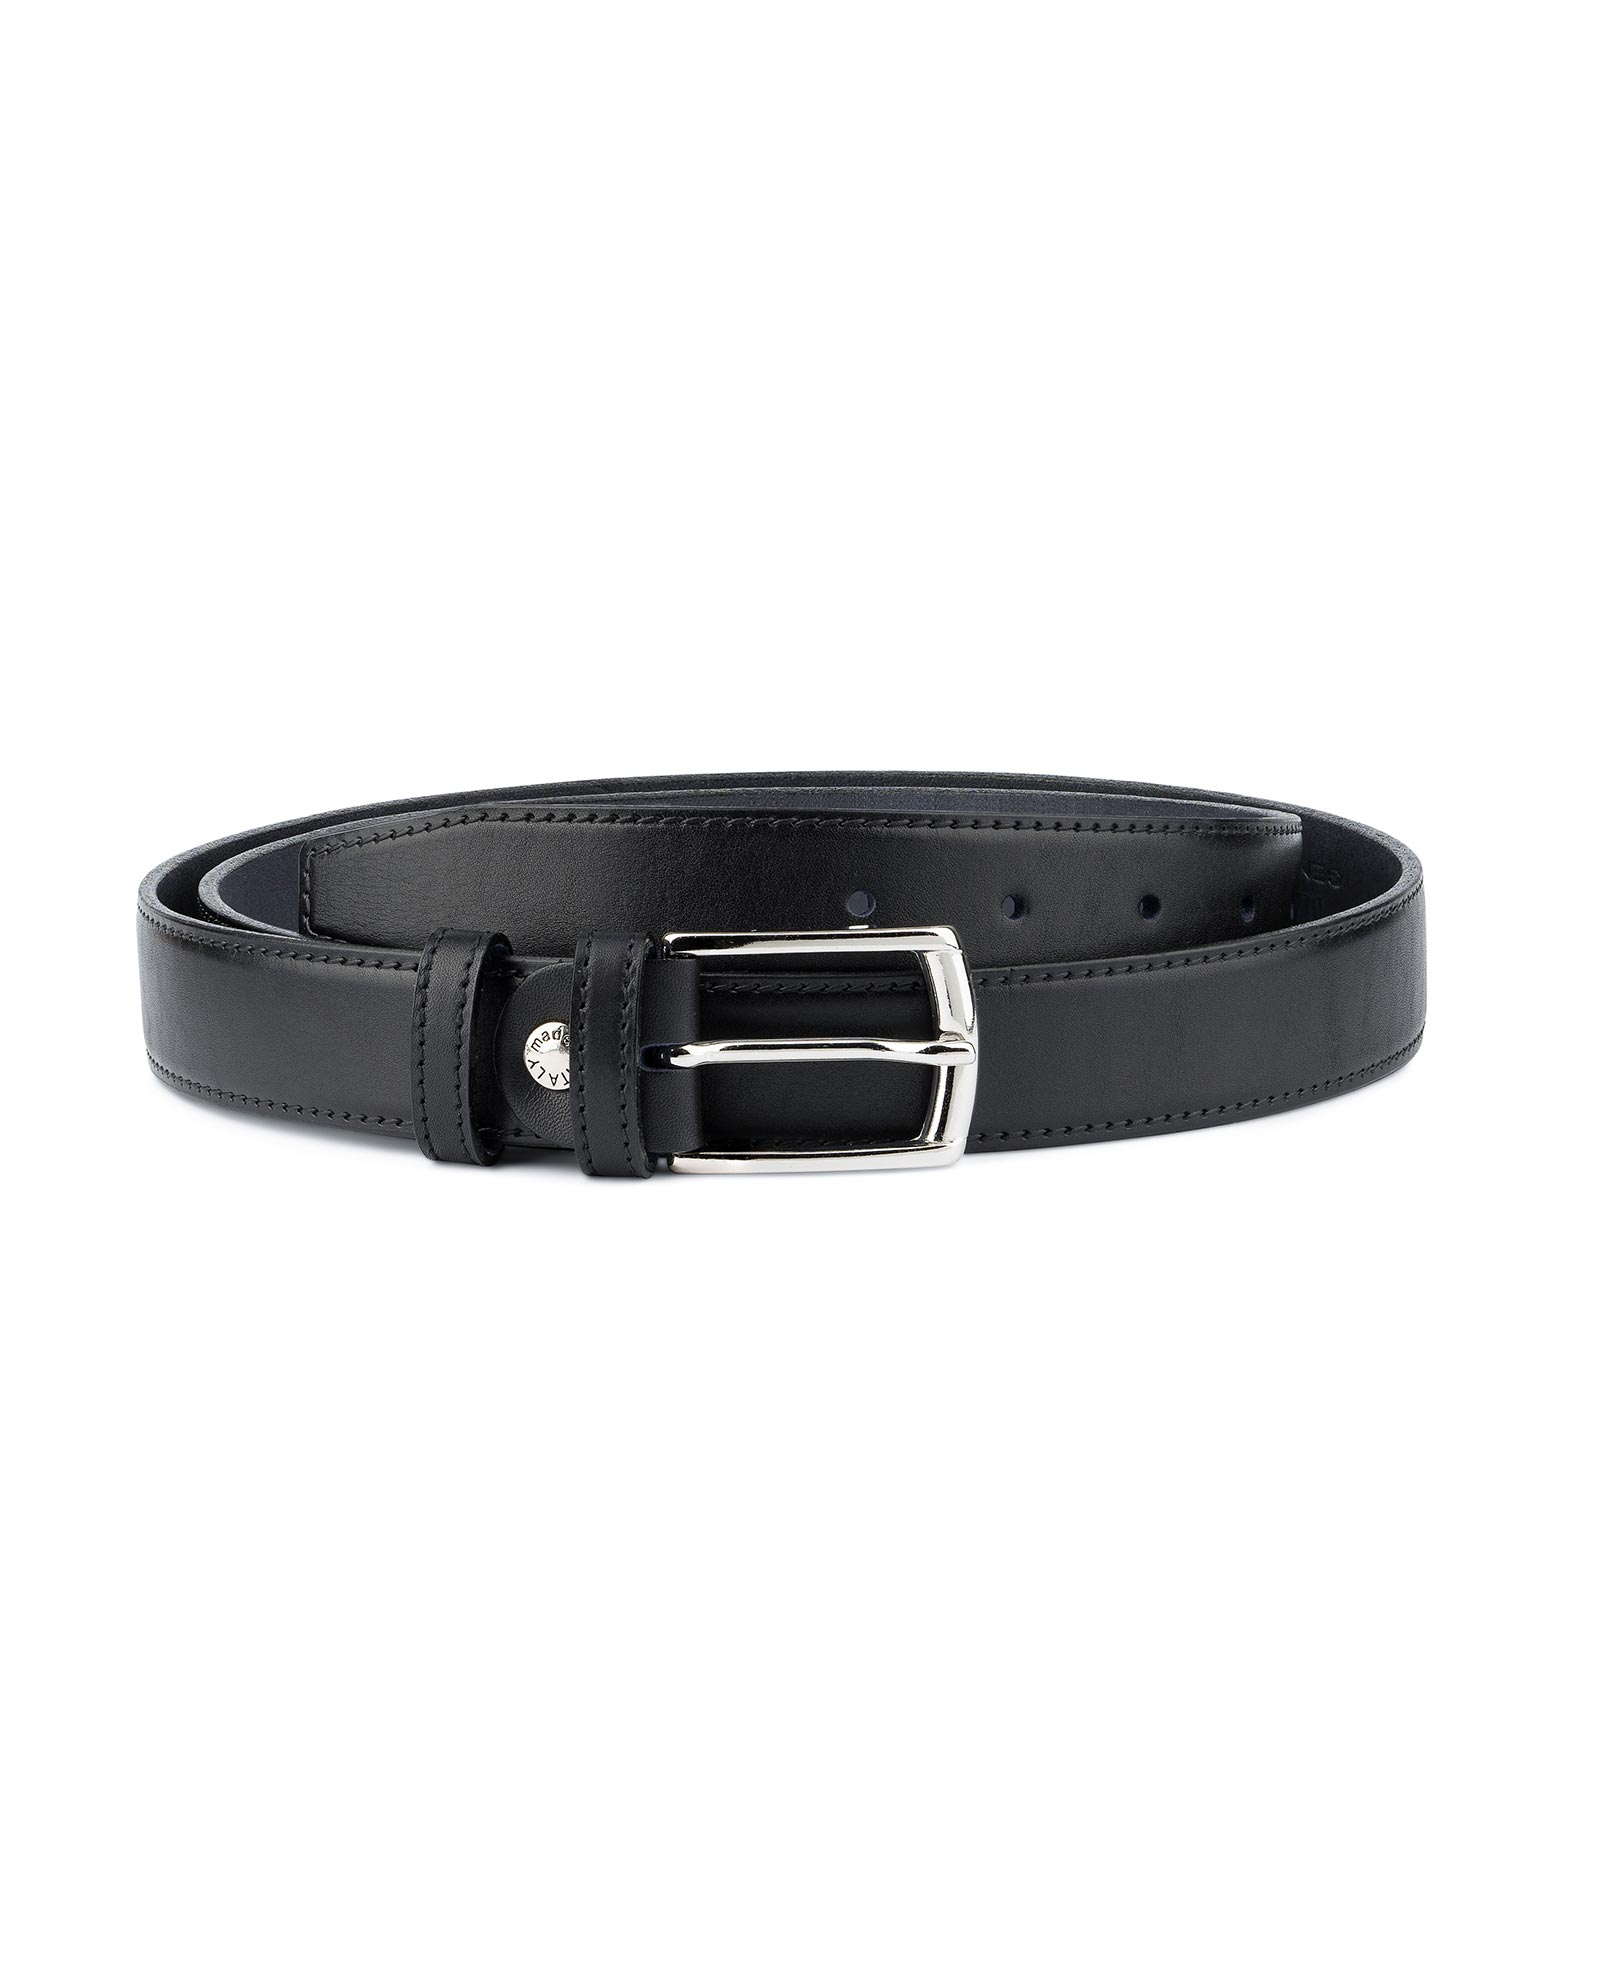 Stylish Black Studded Belt Italian Full Grain Leather